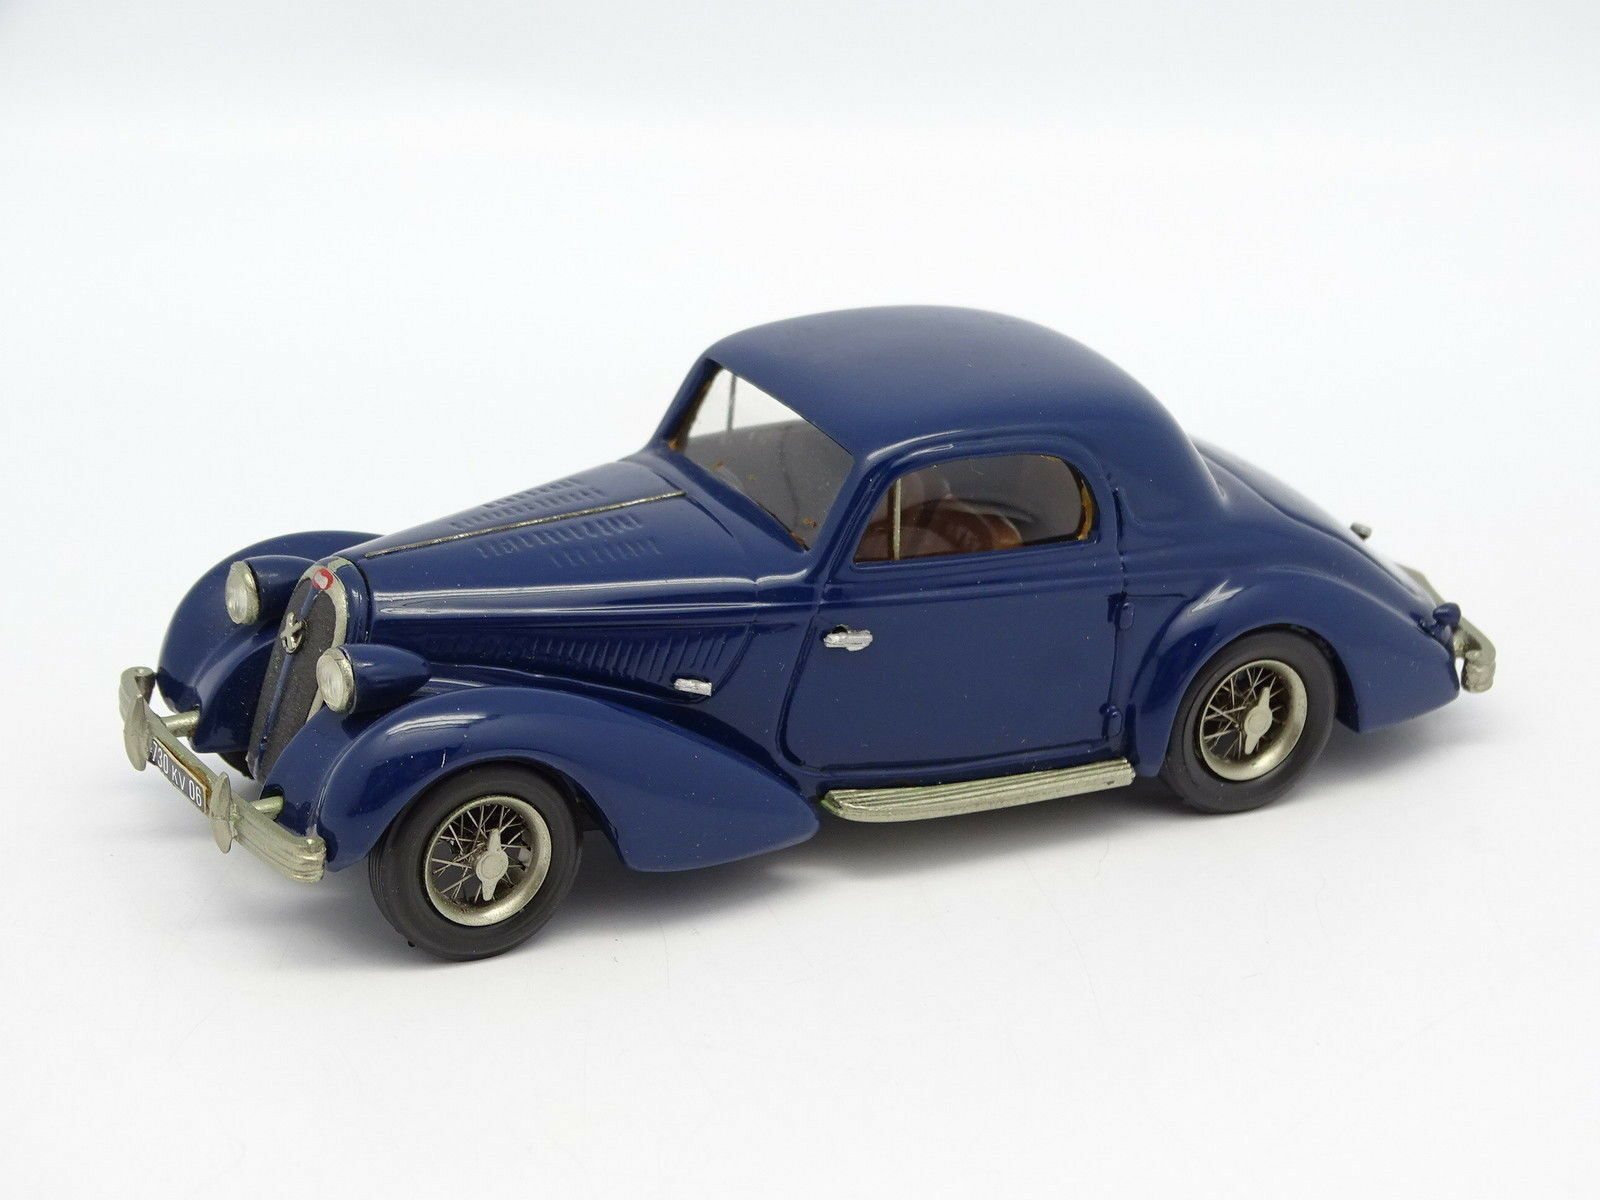 Ma the kit montato 1   43 - hotchkiss gs3 1939 Blau -